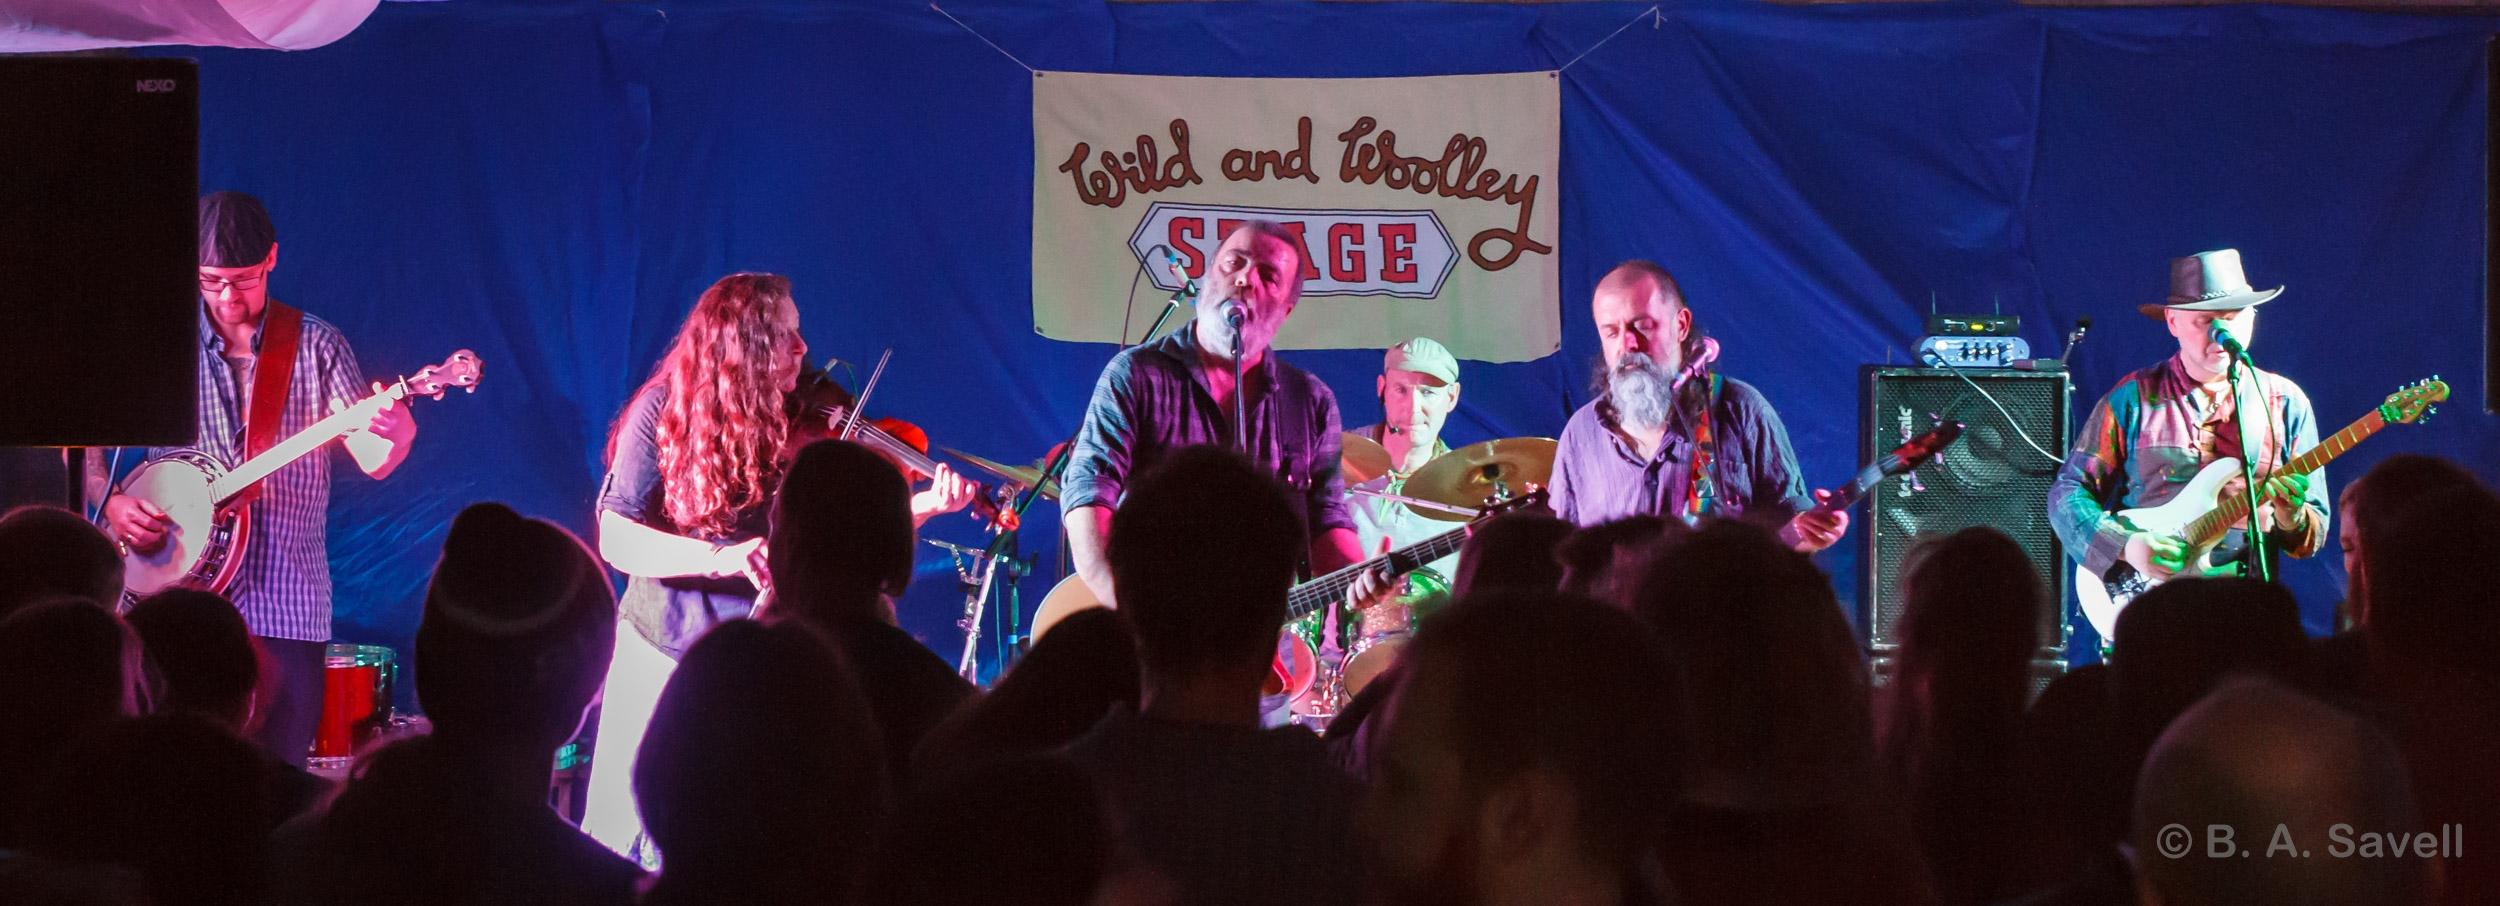 bradford-roots-festival-2018_25078225847_o.jpg